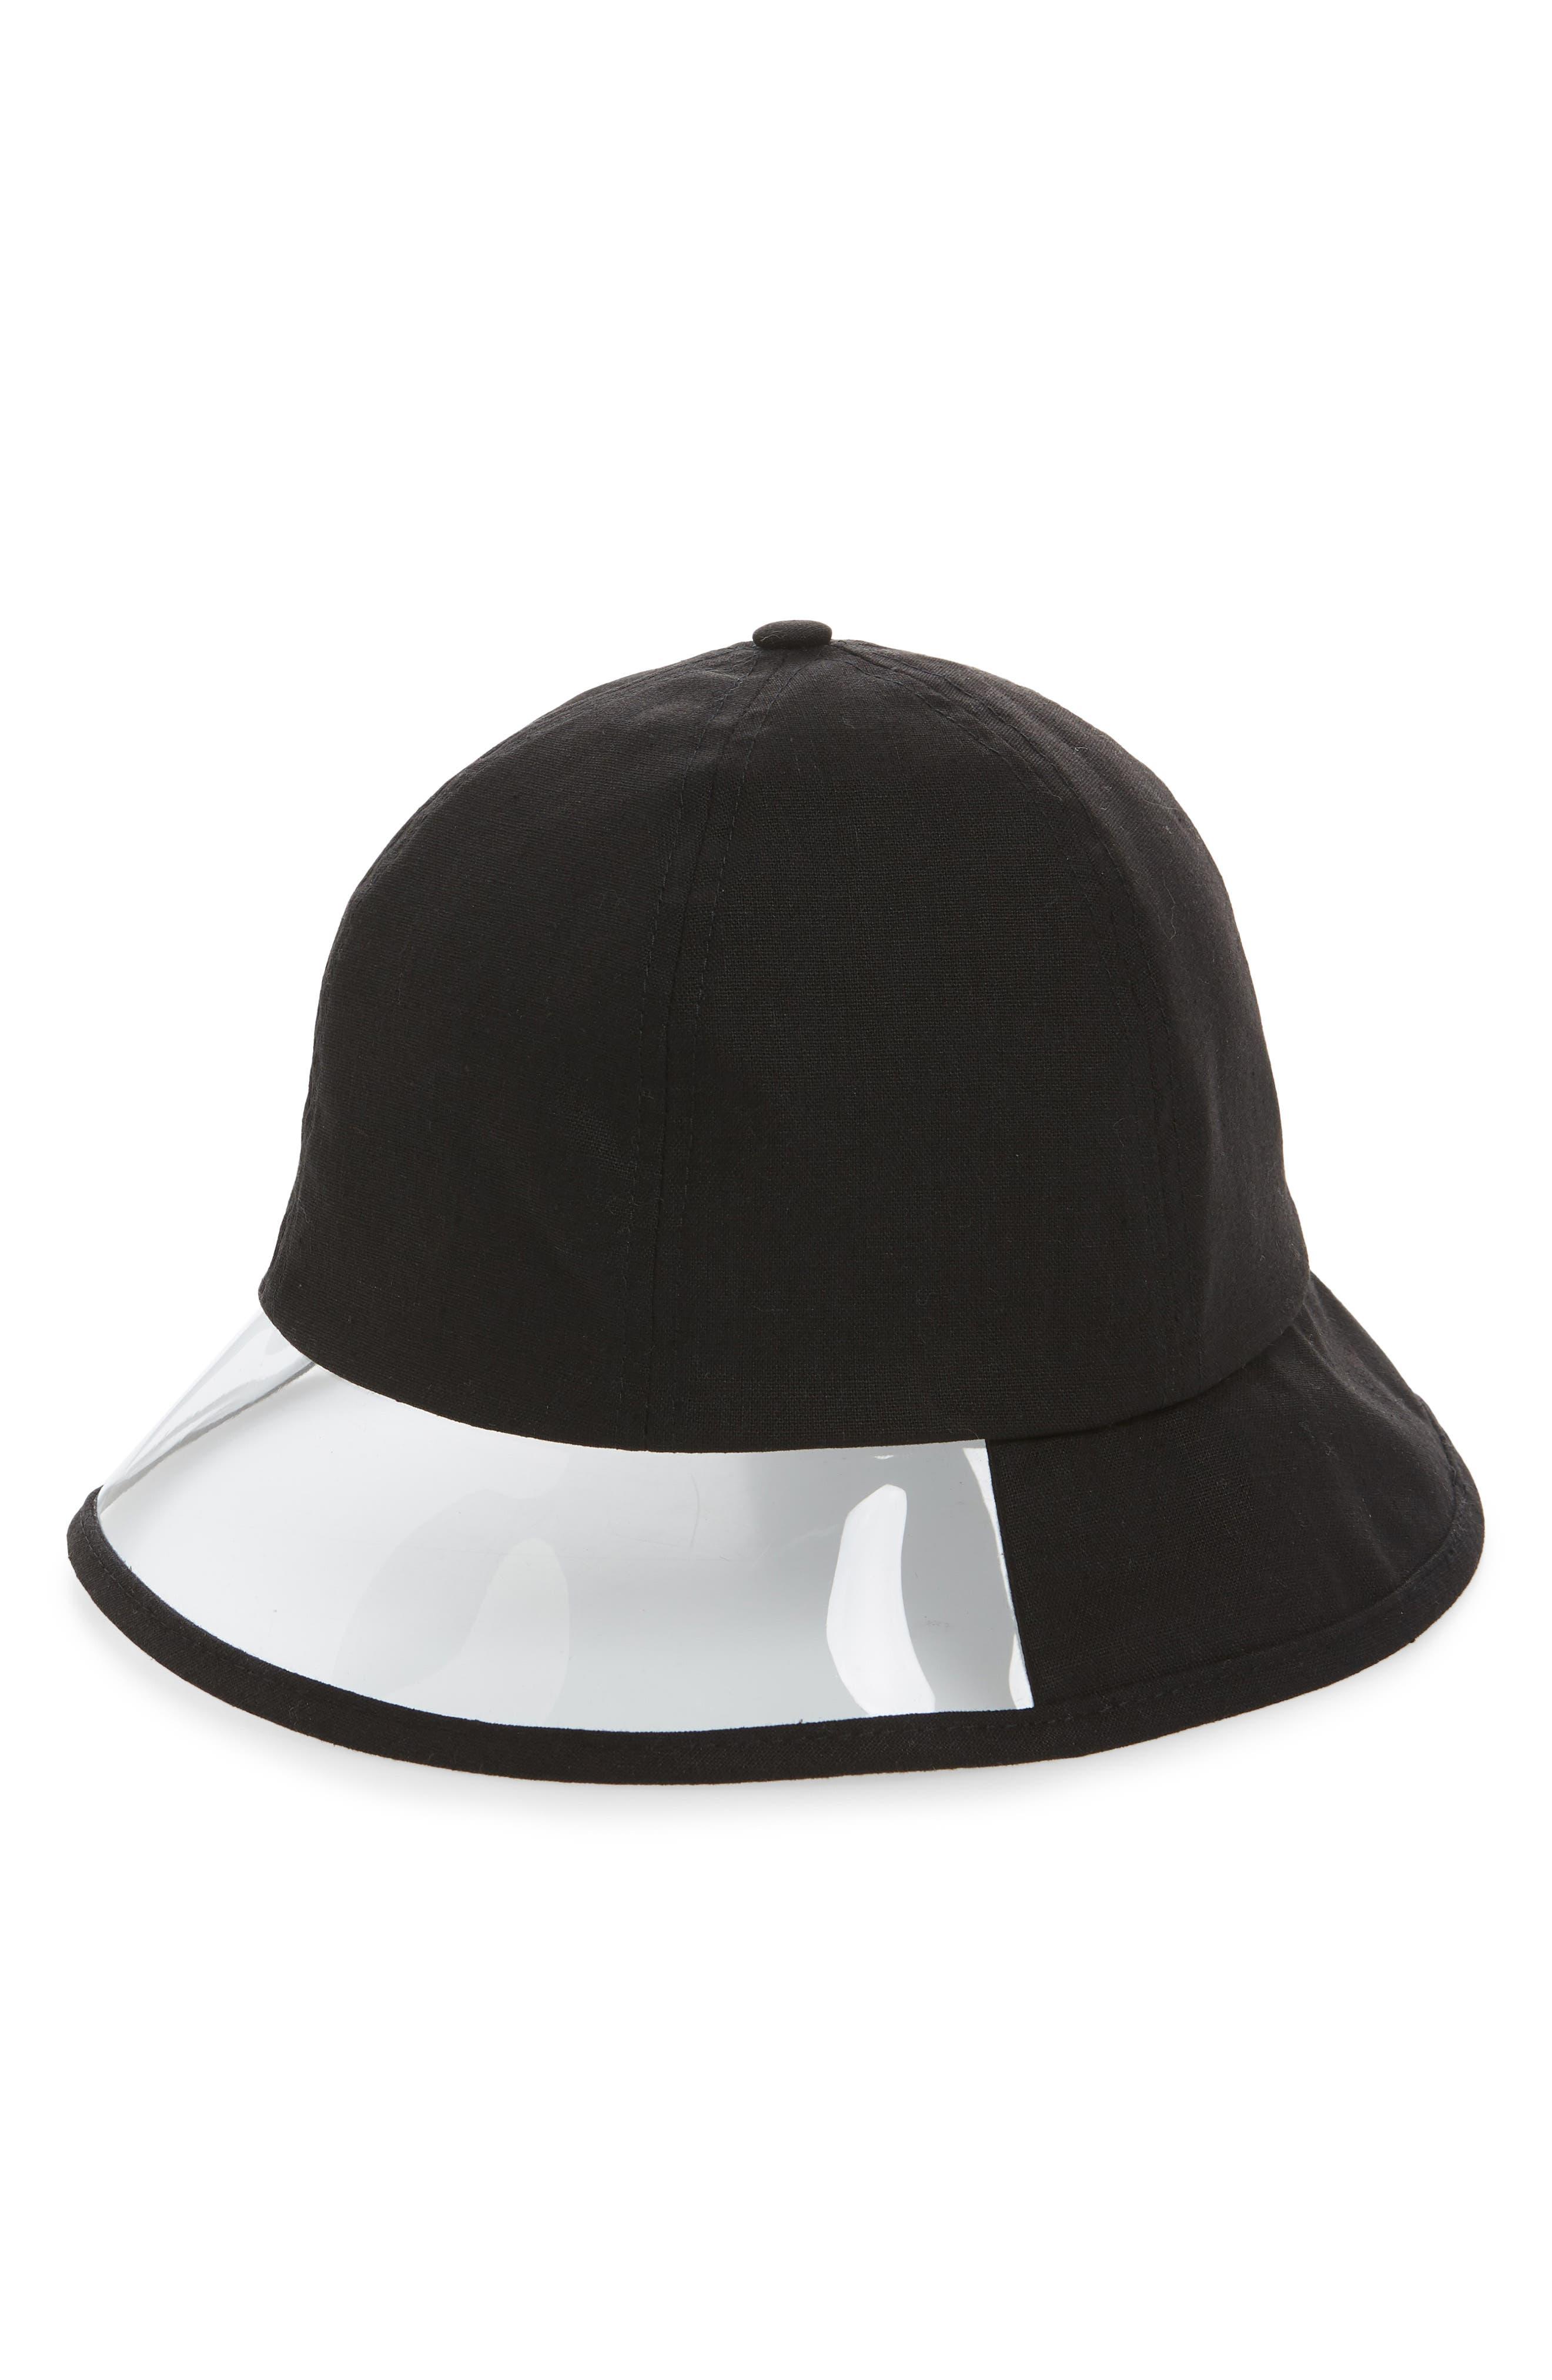 STEVE MADDEN, Transparent Panel Canvas Bucket Hat, Main thumbnail 1, color, BLACK